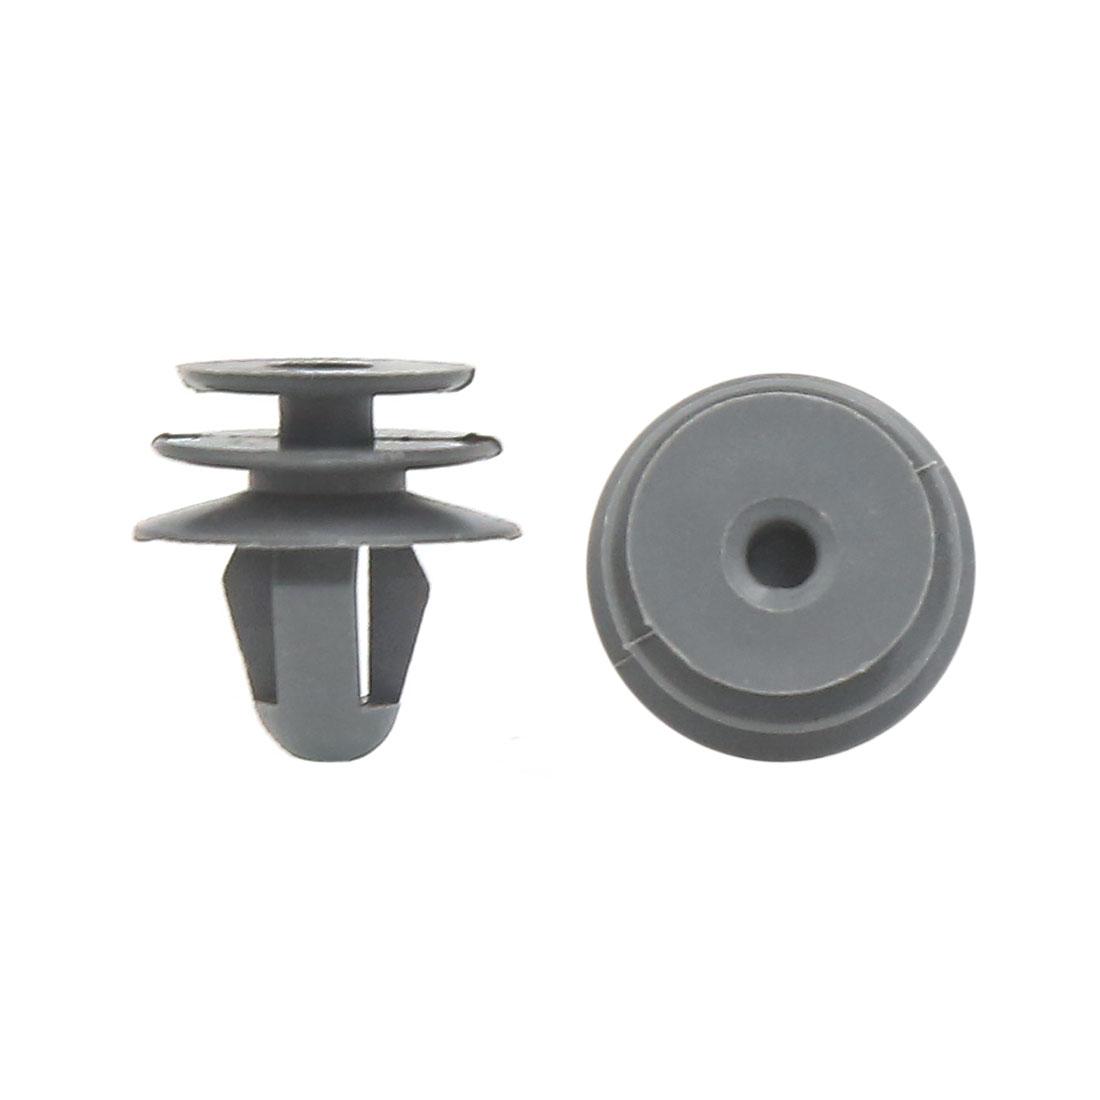 100 Pcs Gray Bumper Fender 8mm Hole Plastic Rivets Trim Fasteners for Car Auto